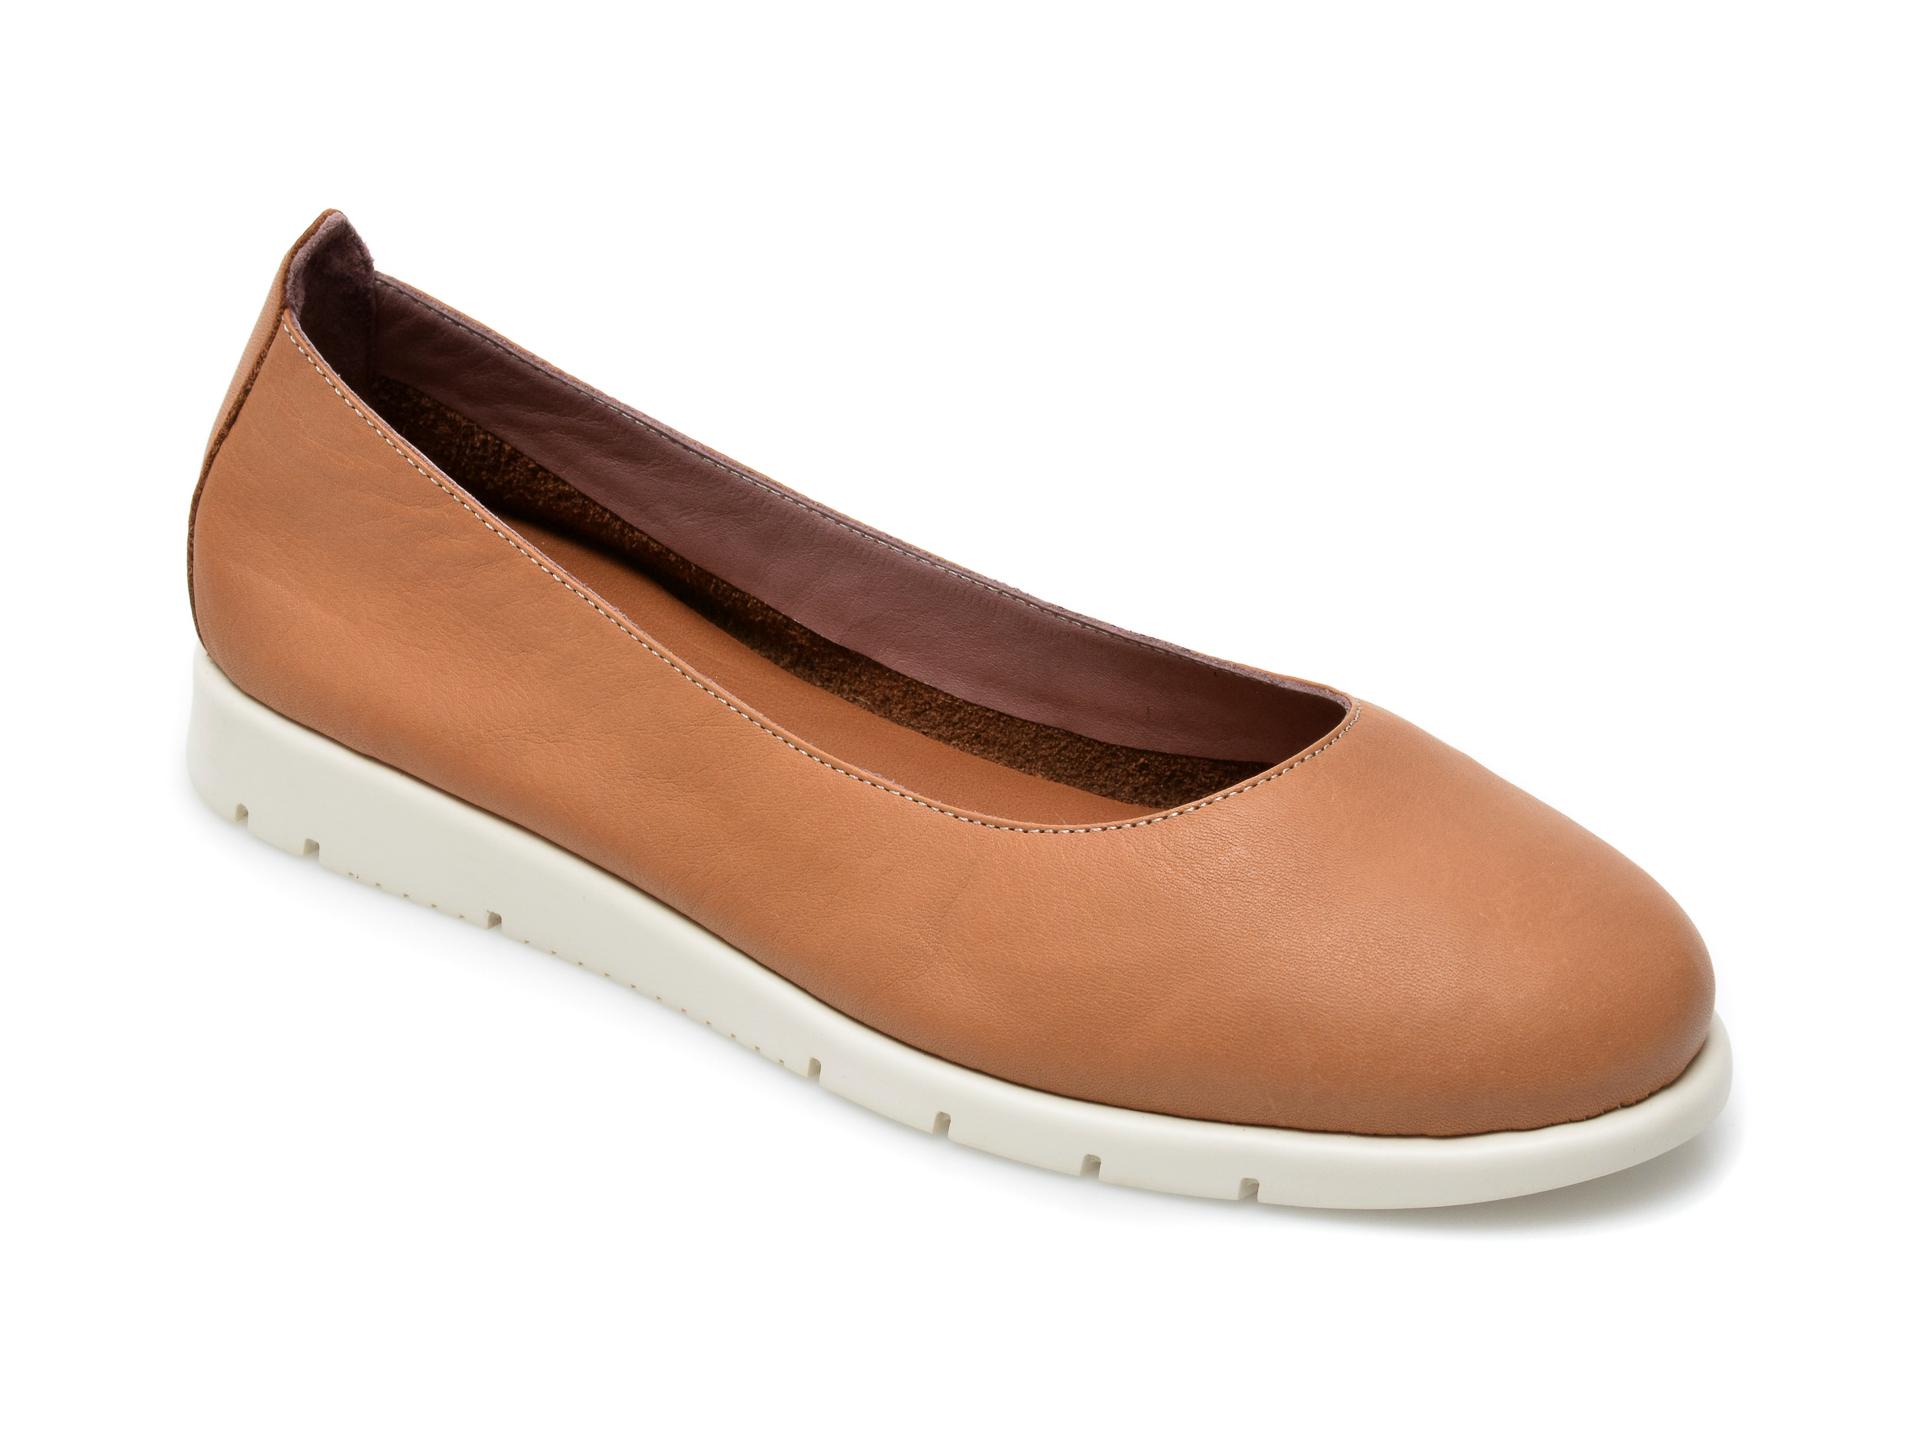 Pantofi FLAVIA PASSINI maro, 181, din piele naturala imagine otter.ro 2021